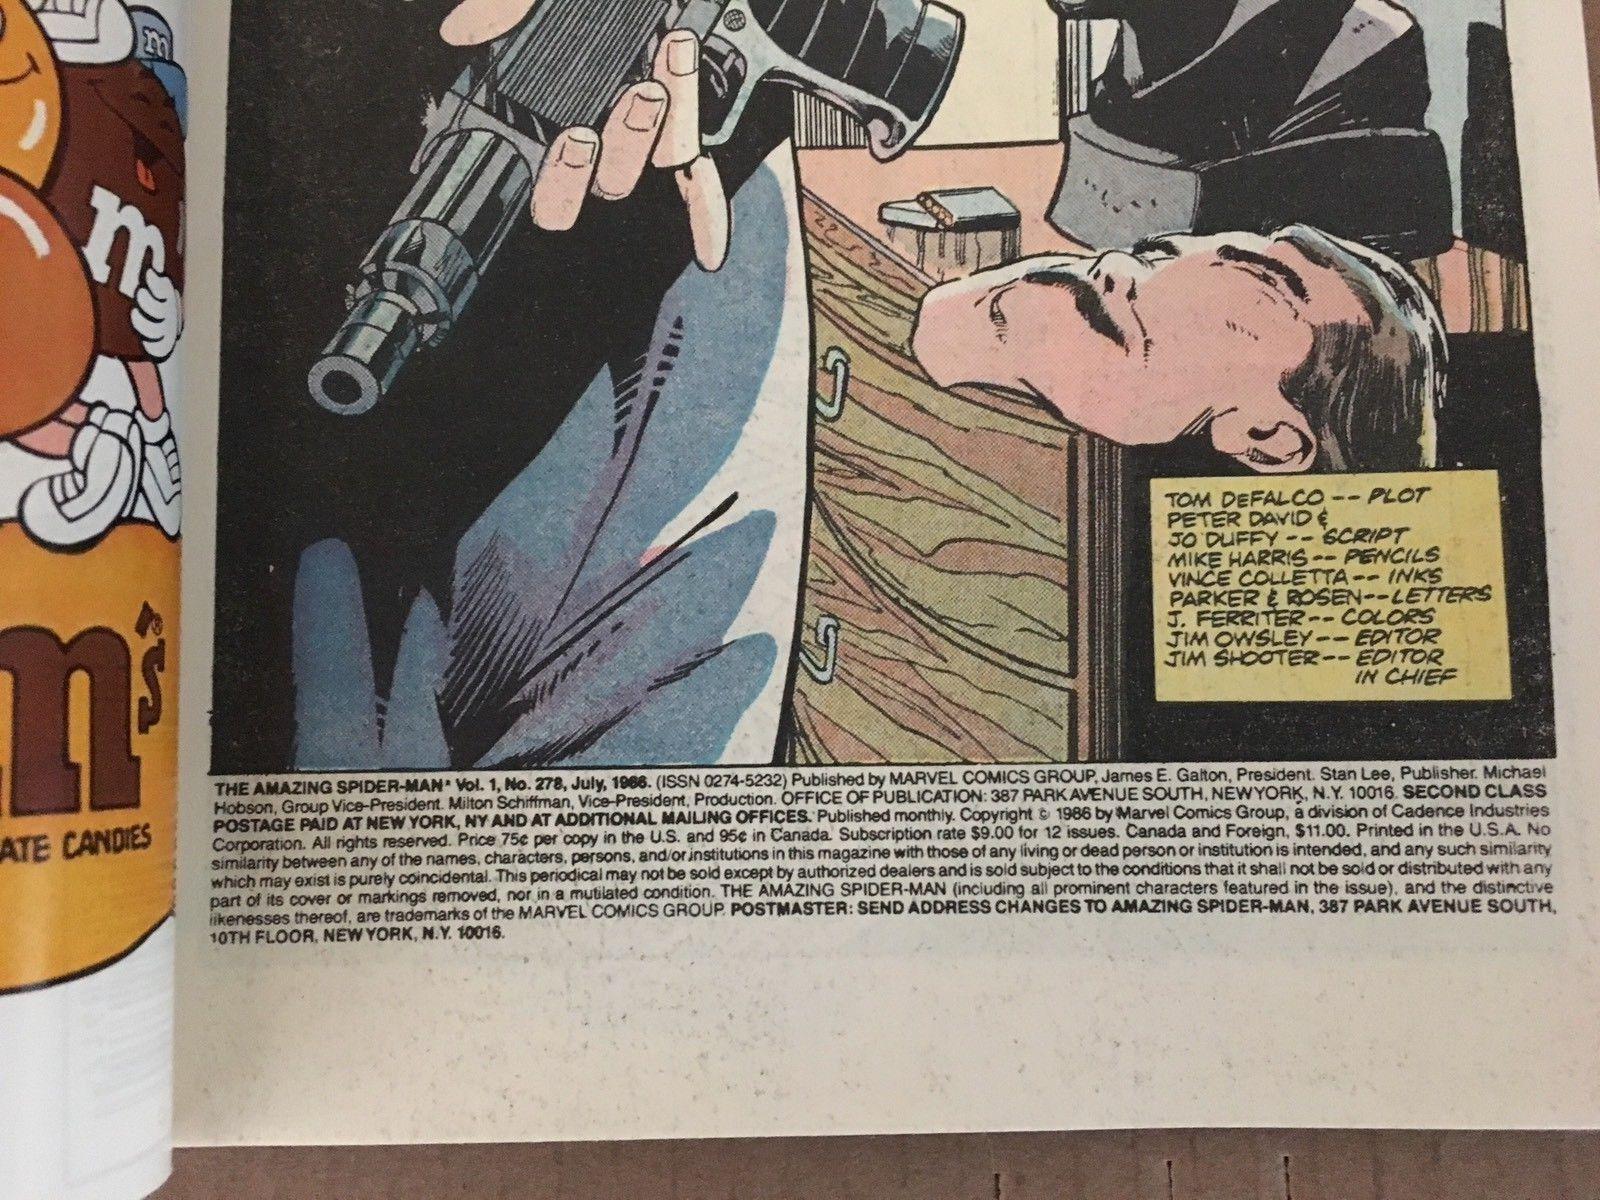 Amazing Spider-Man #278 Marvel Comic Book VF (8.0) Condition 1986 Hobgoblin